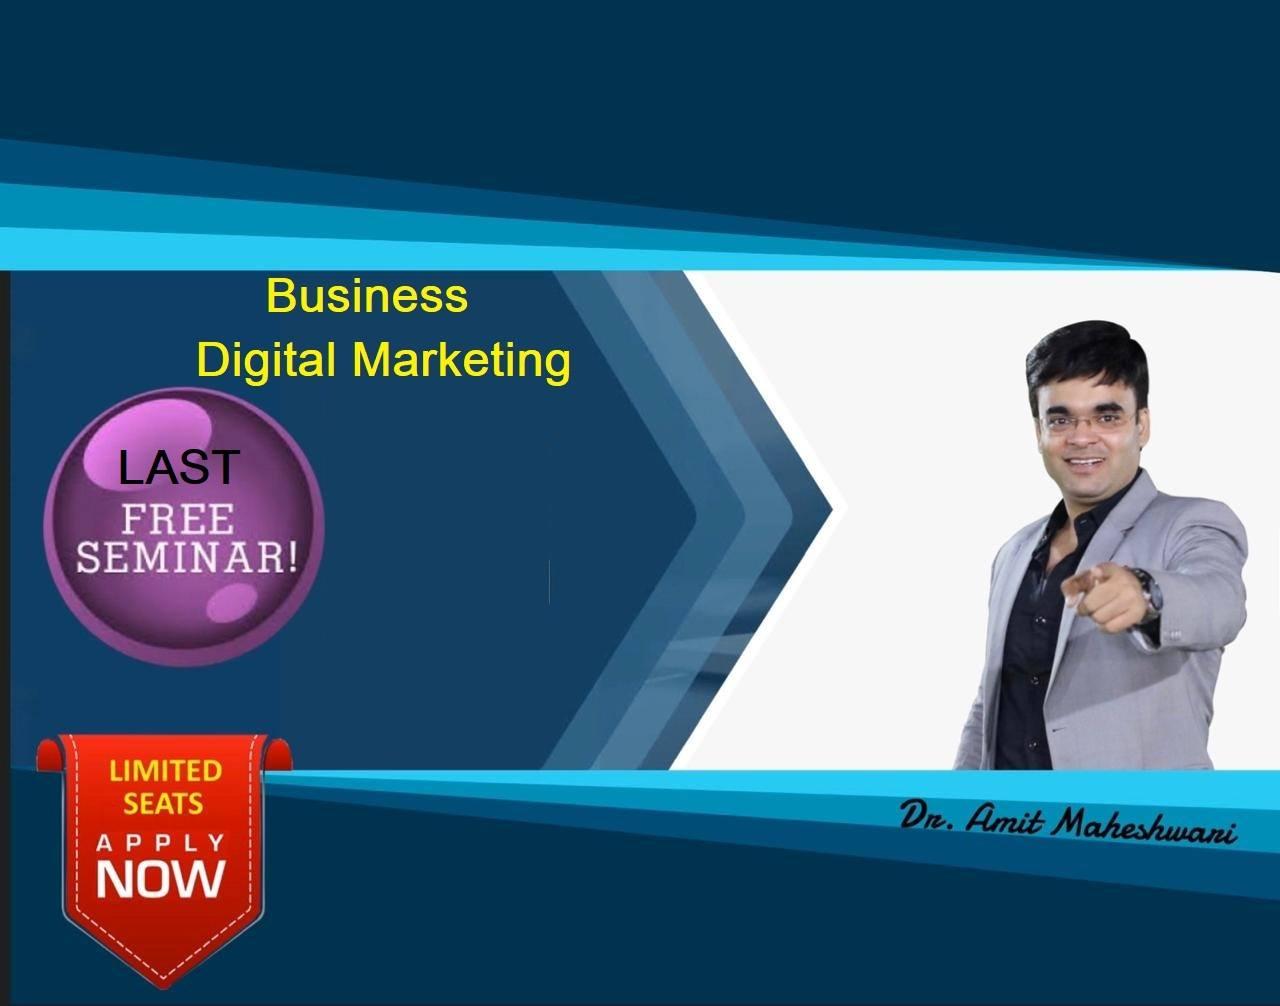 Last Free Business Digital Marketing Seminar on 29th Dec 11 AM